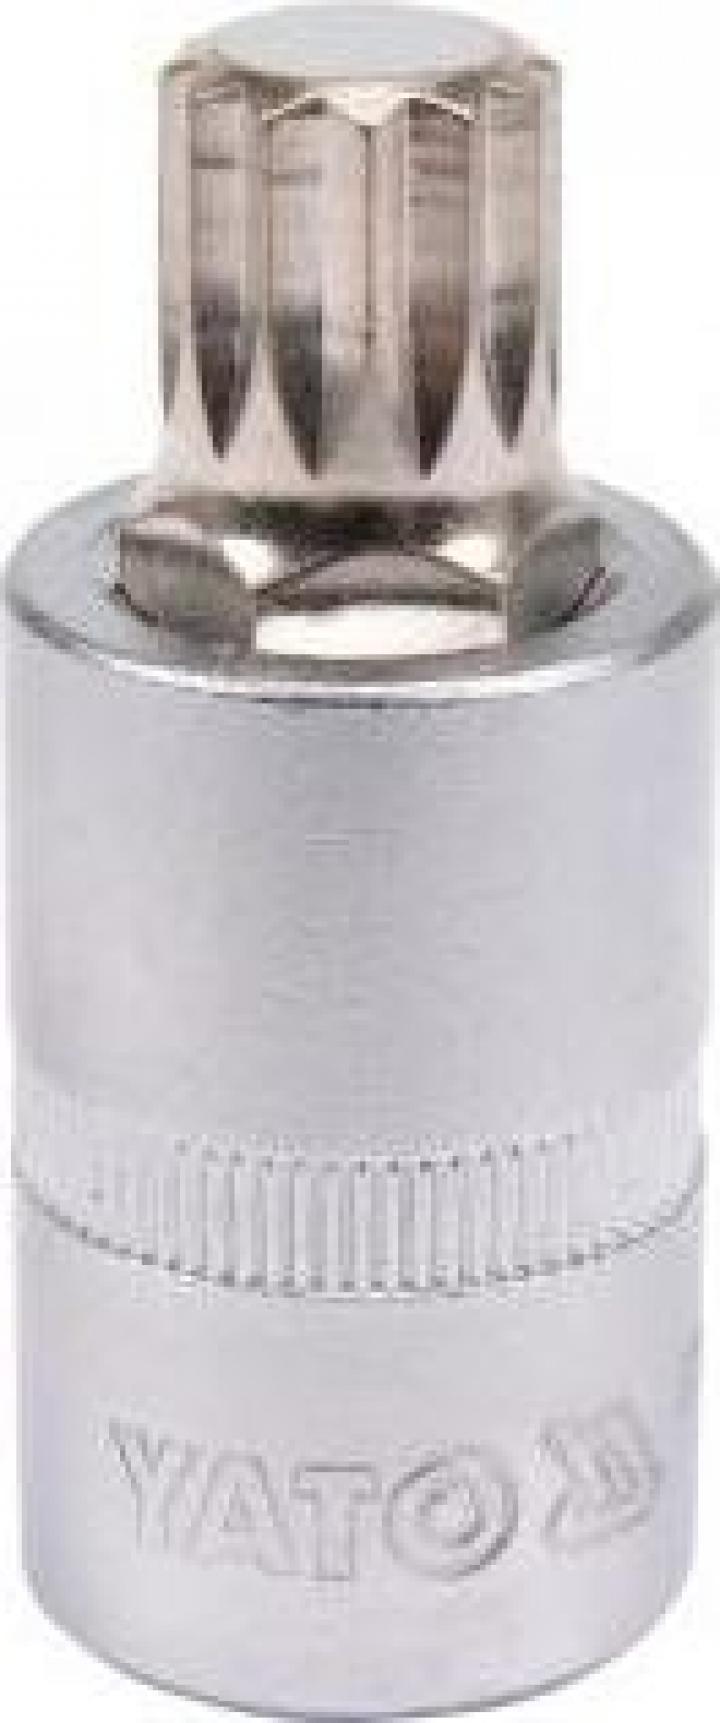 "Bit Spline M14 cu adaptor 1 2"", 55 mm, Cr-V, Yato YT-04345"